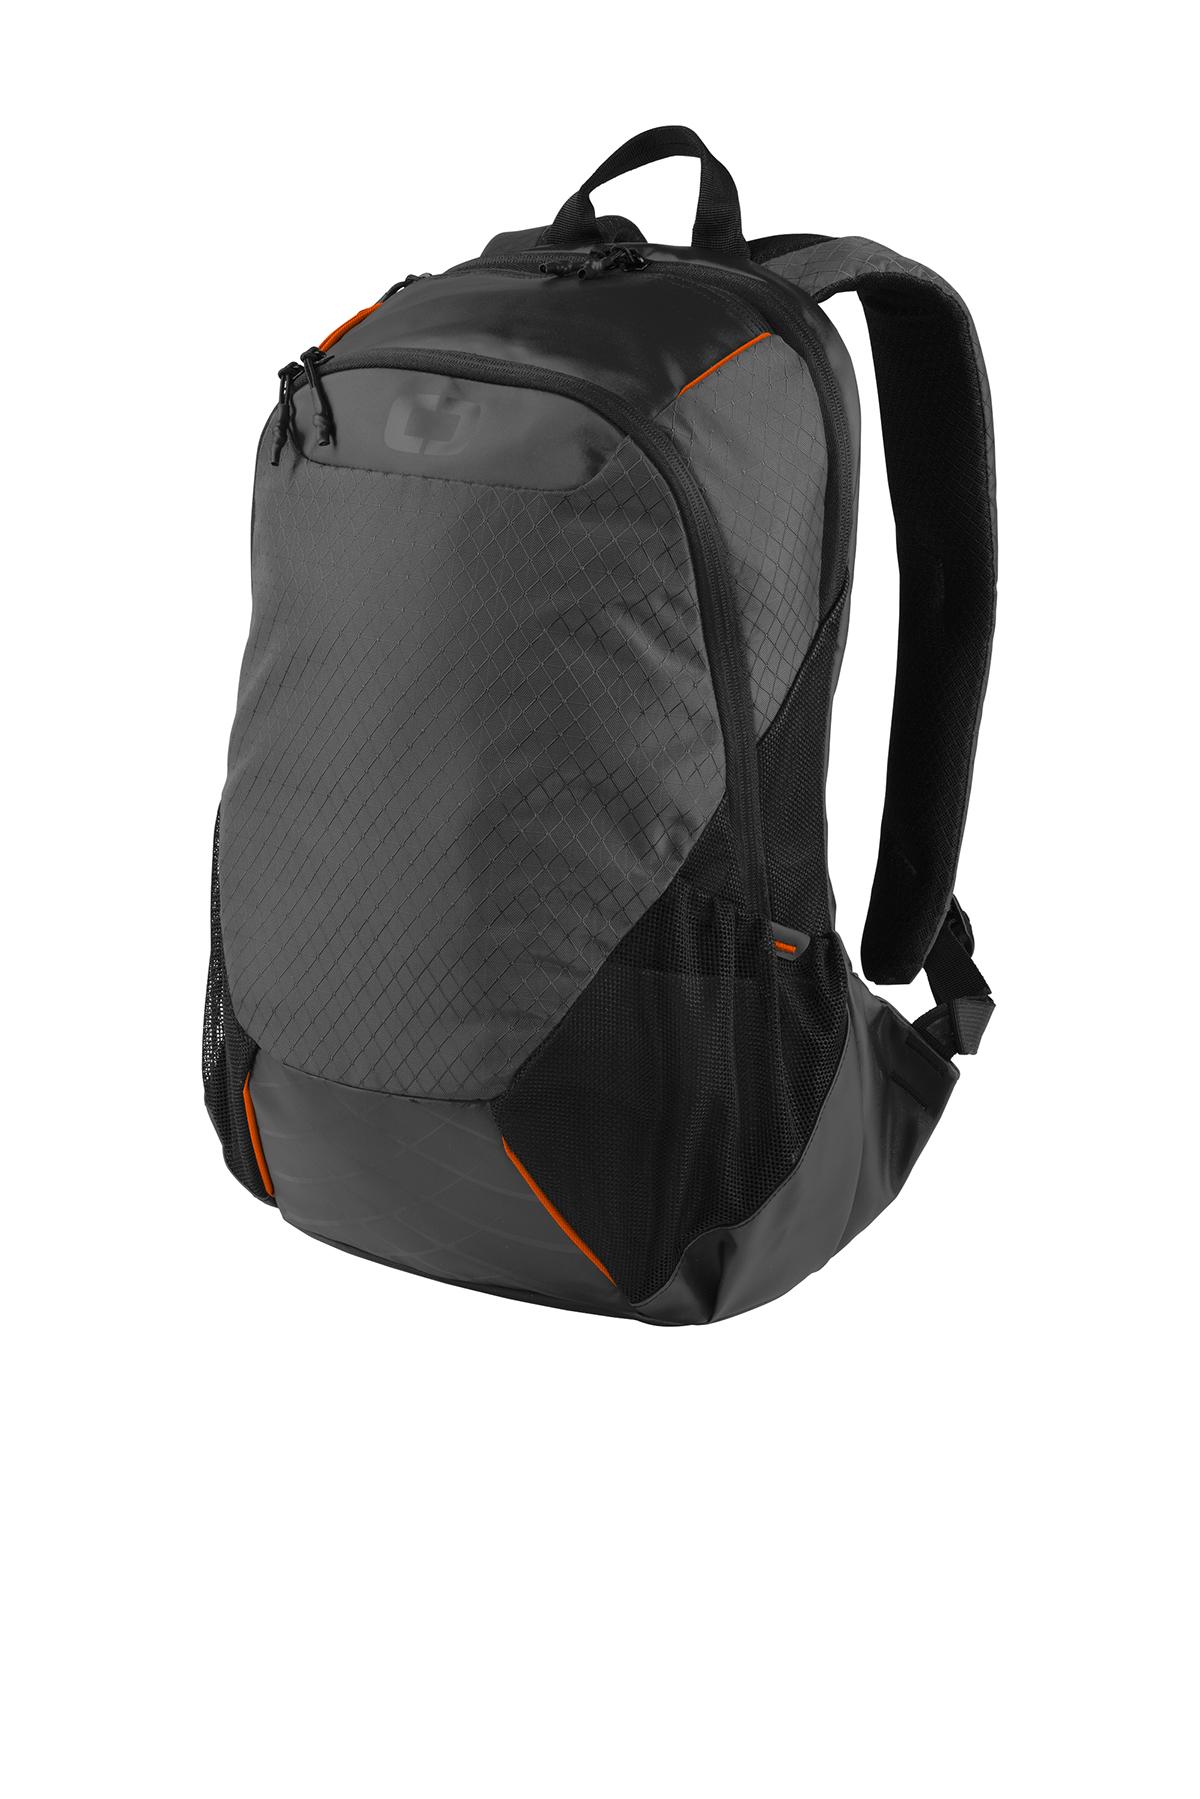 OGIO 91003 - Basis Pack